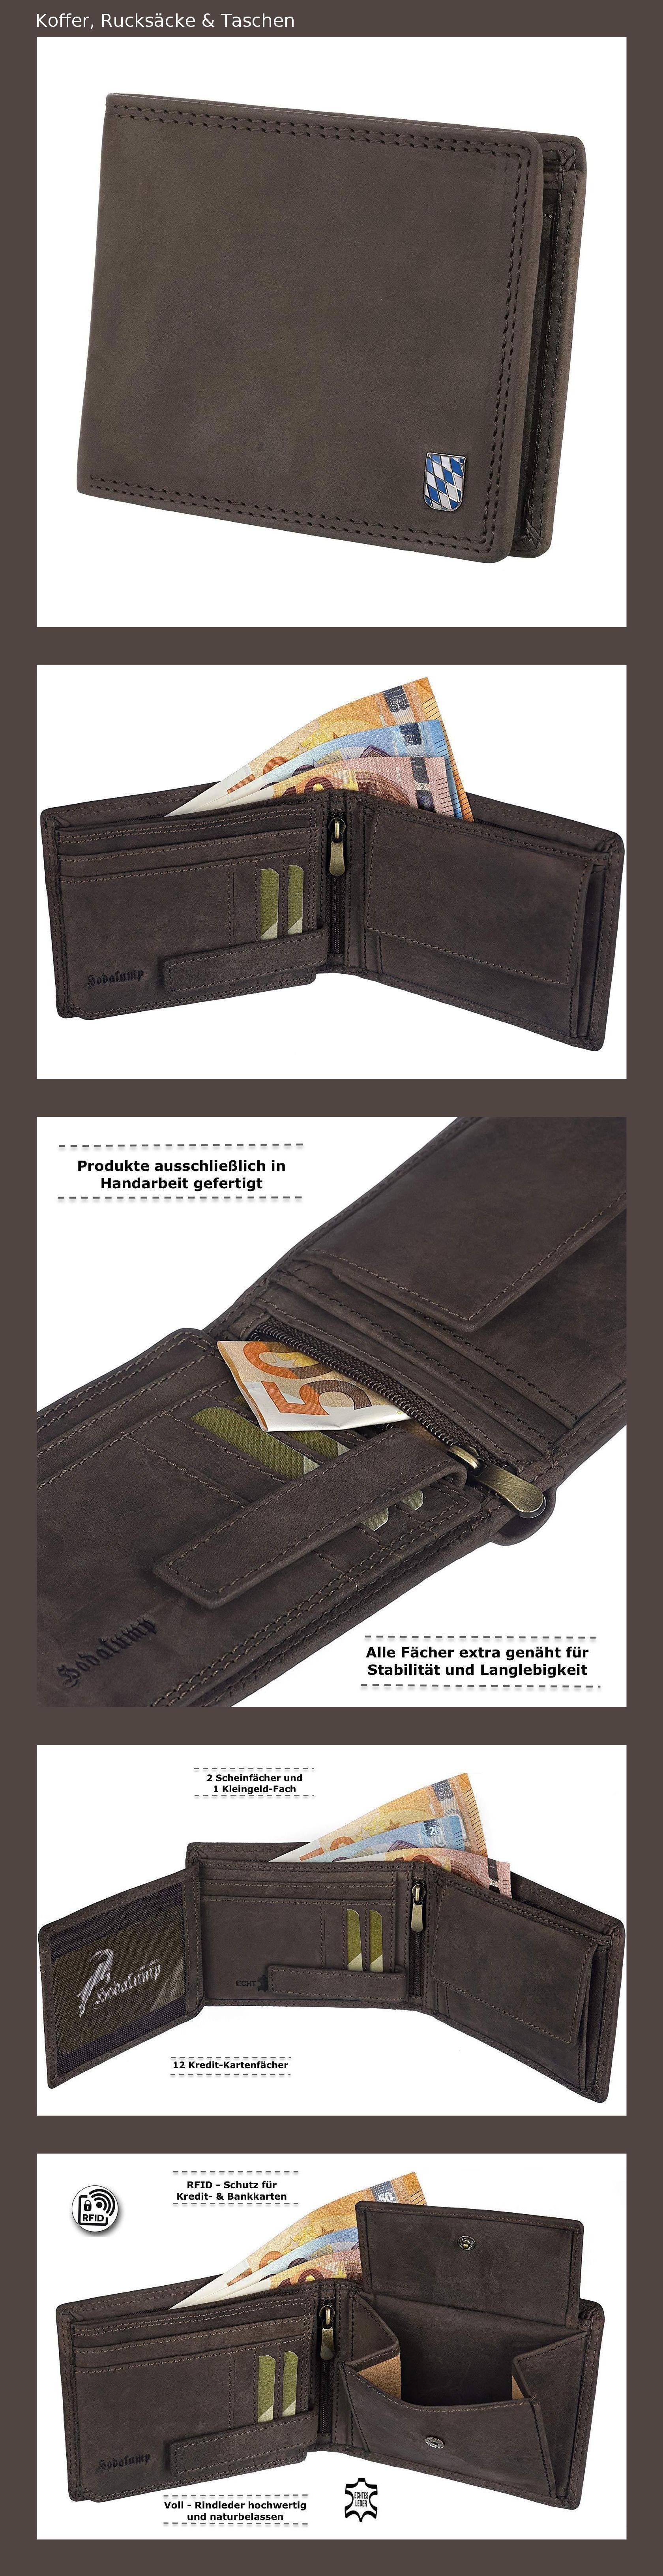 5e8ee754c3c2d perfect leder geldbrse herren premium geldbeutel echtleder wallet portmonee  with geldborse herren